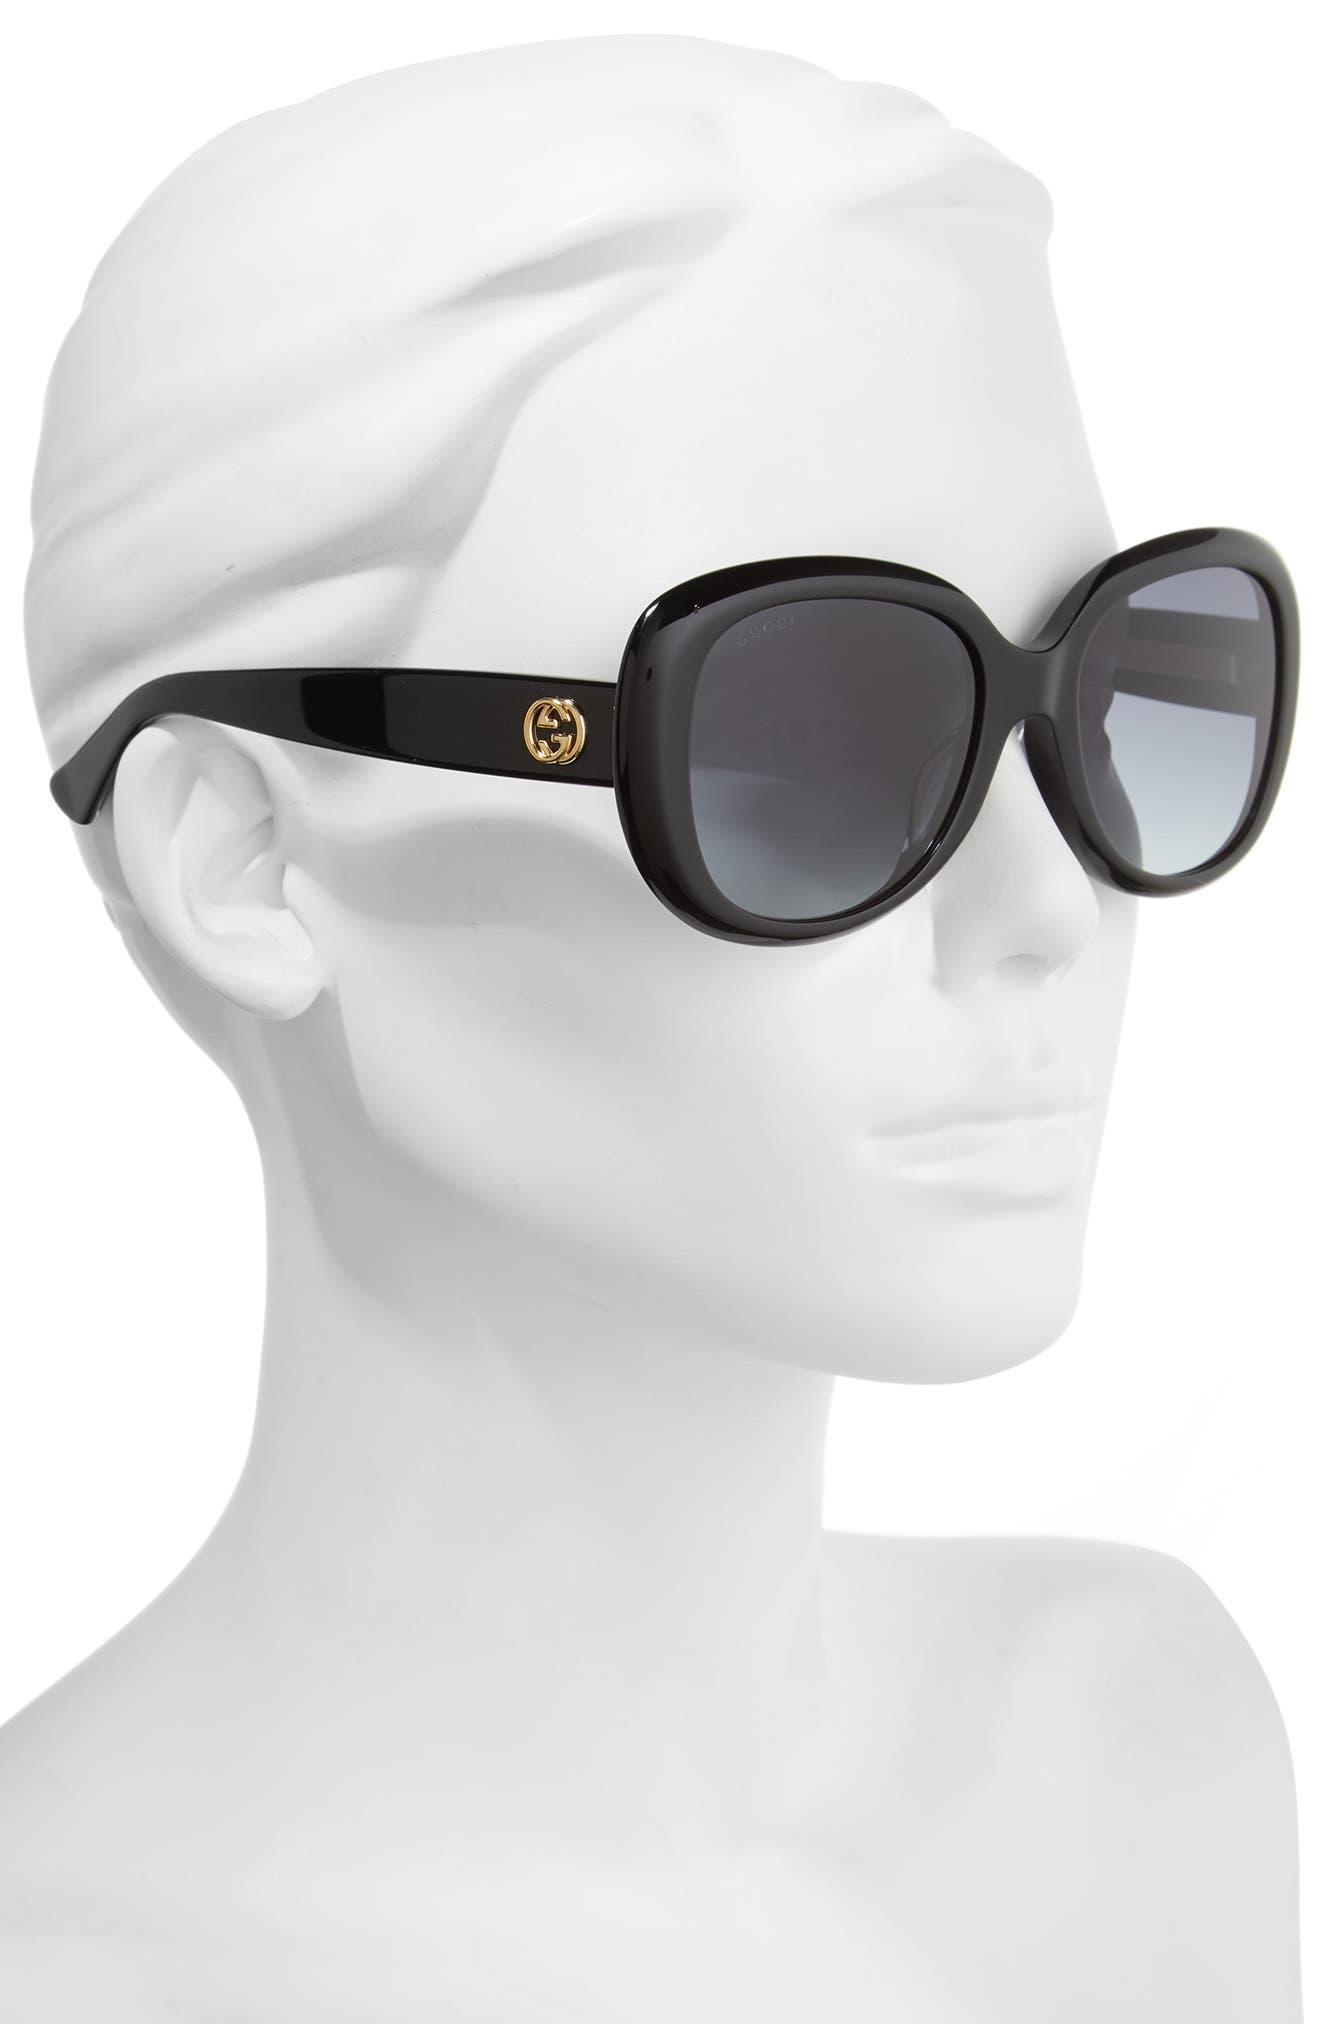 55mm Rectangular Sunglasses,                             Alternate thumbnail 2, color,                             001